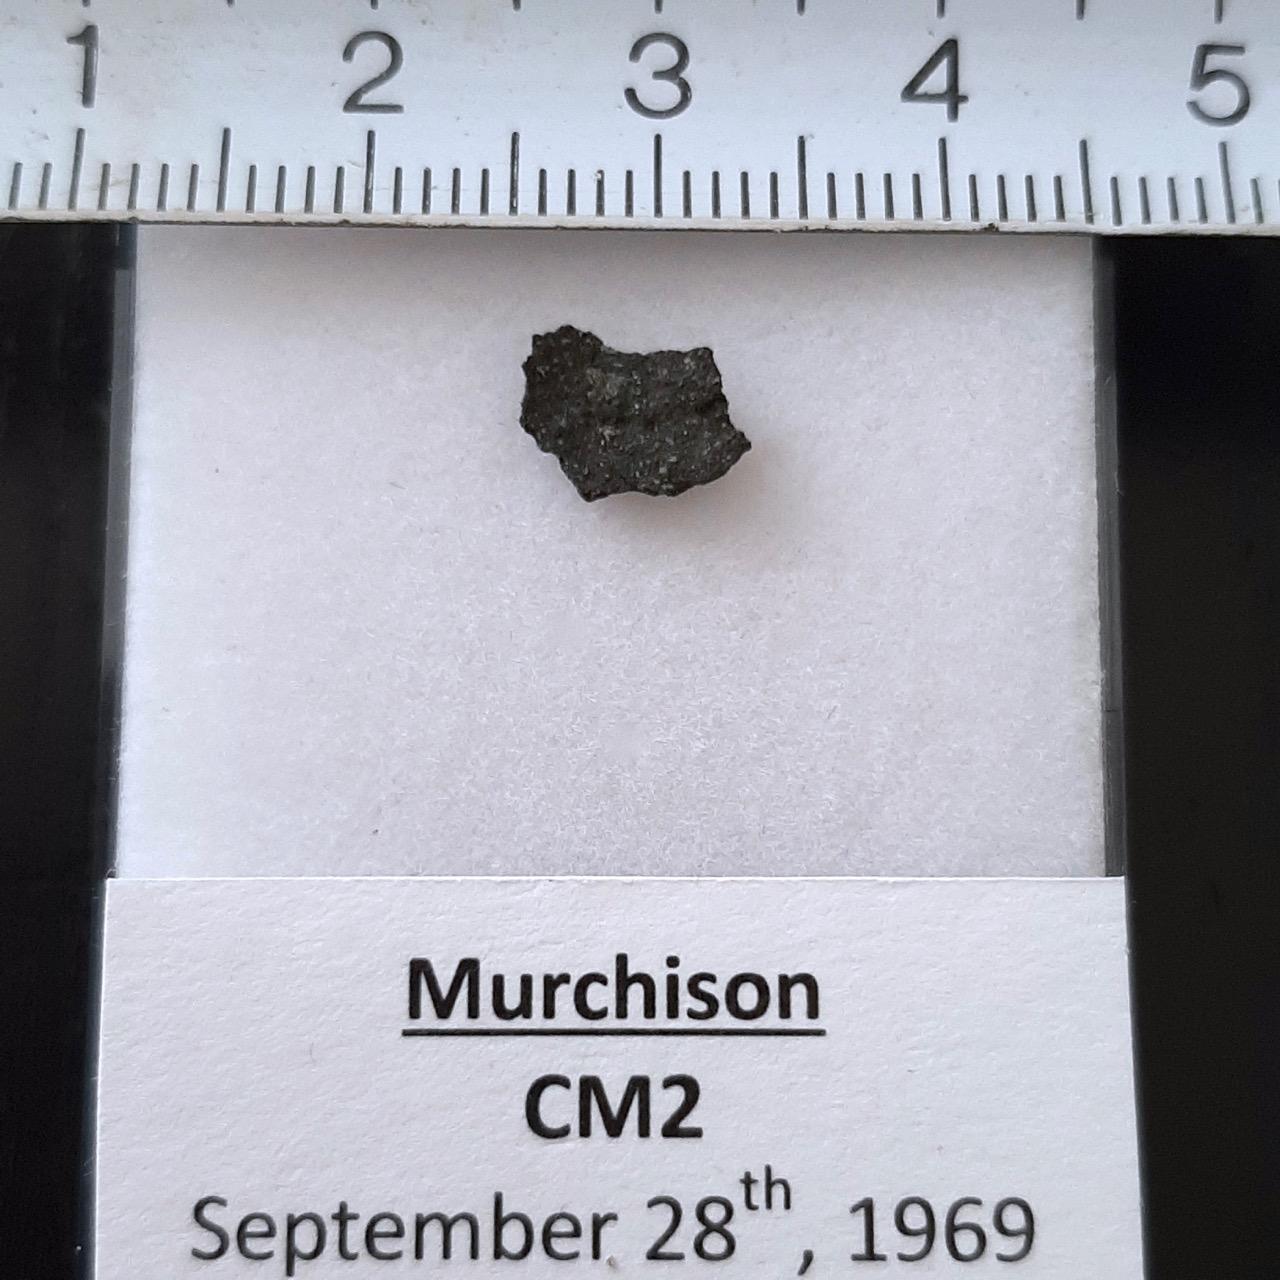 Murchison meteorite. CM2 with pre-solar grains.